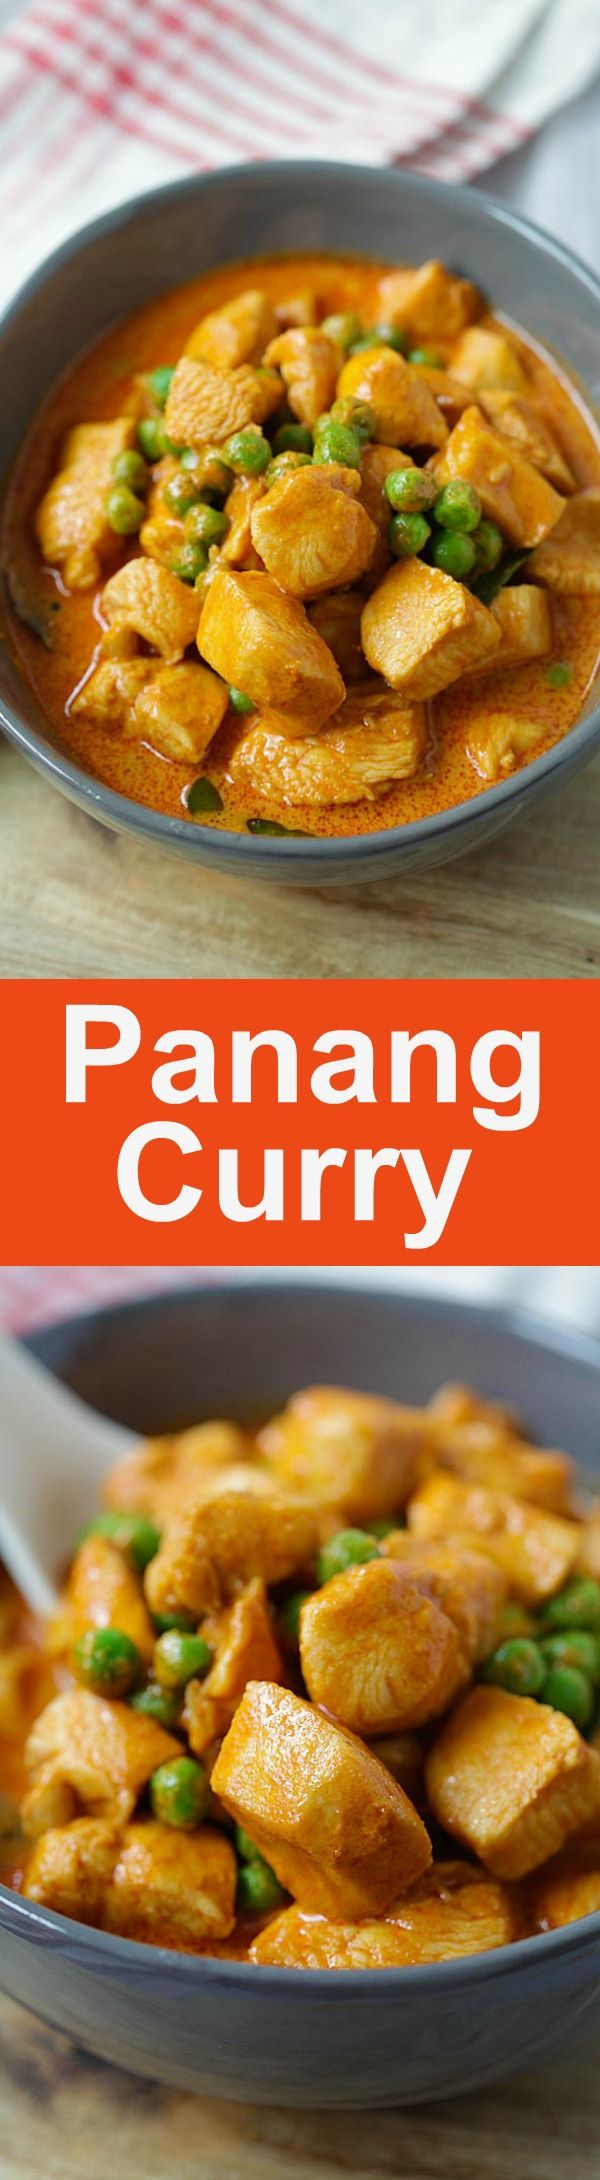 100 best Rezepte - Indisch. images on Pinterest | Cooking food ...